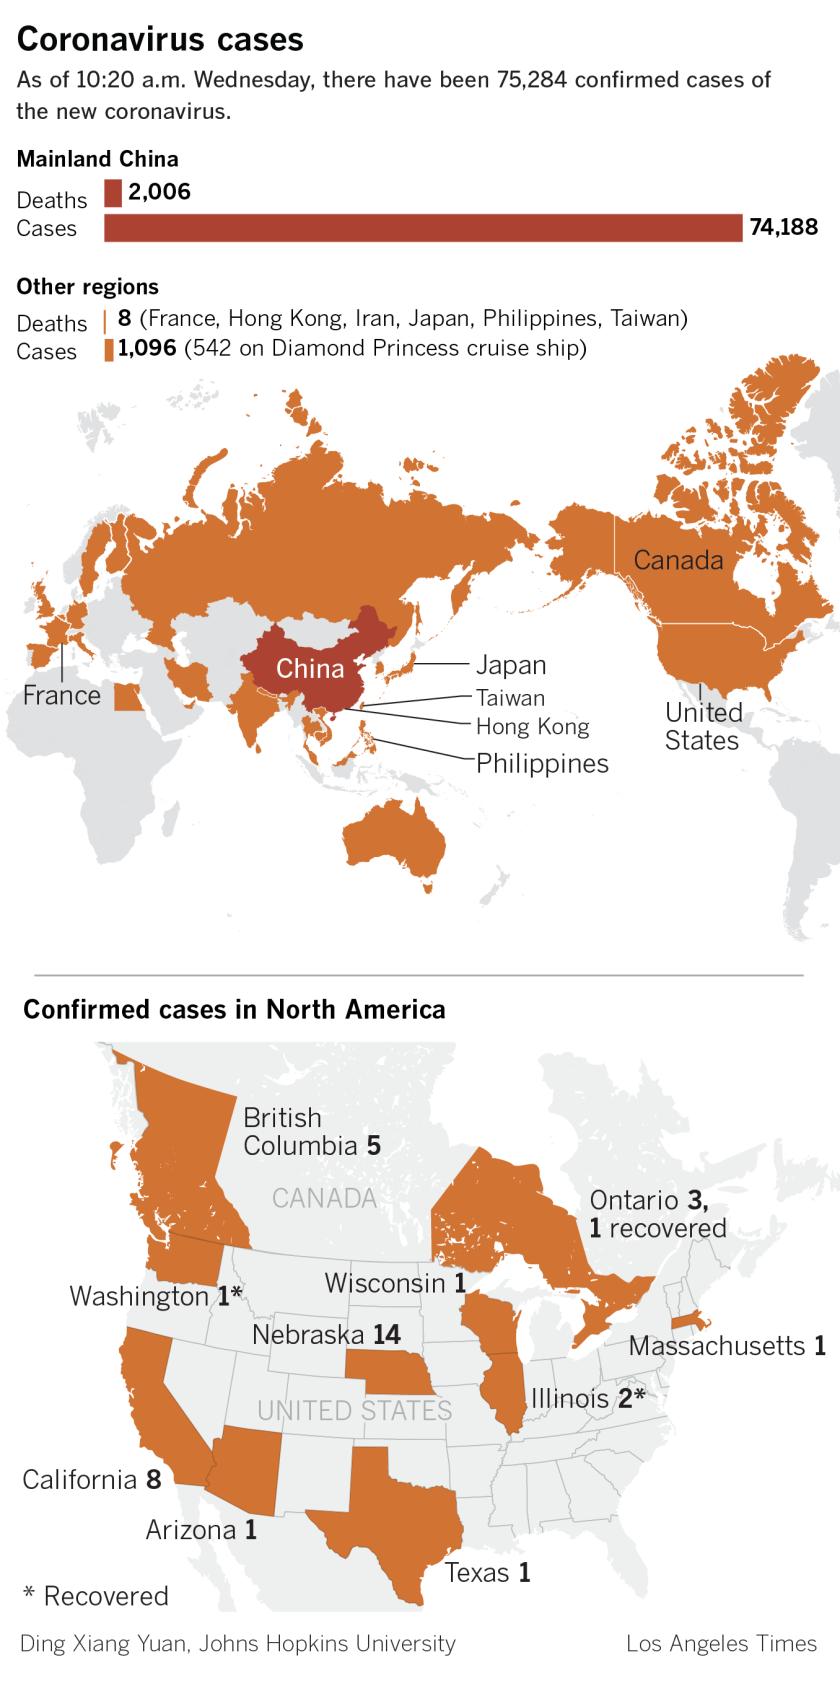 w10-la-sci-coronavirus-china-spreading.png